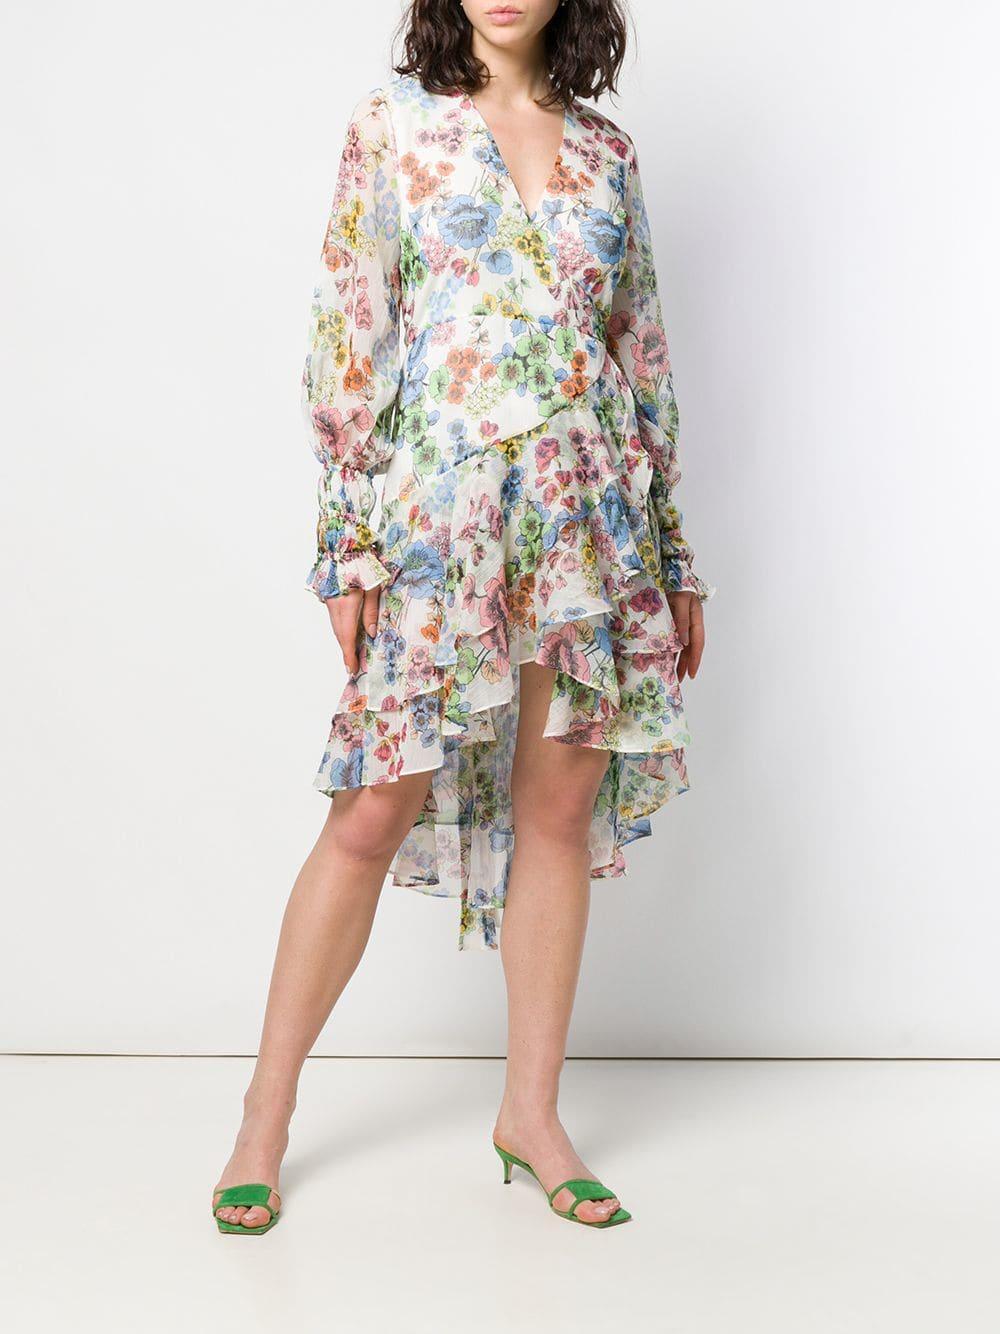 2c1849f1094988 Lyst - Alexis Floral Print Wrap Dress